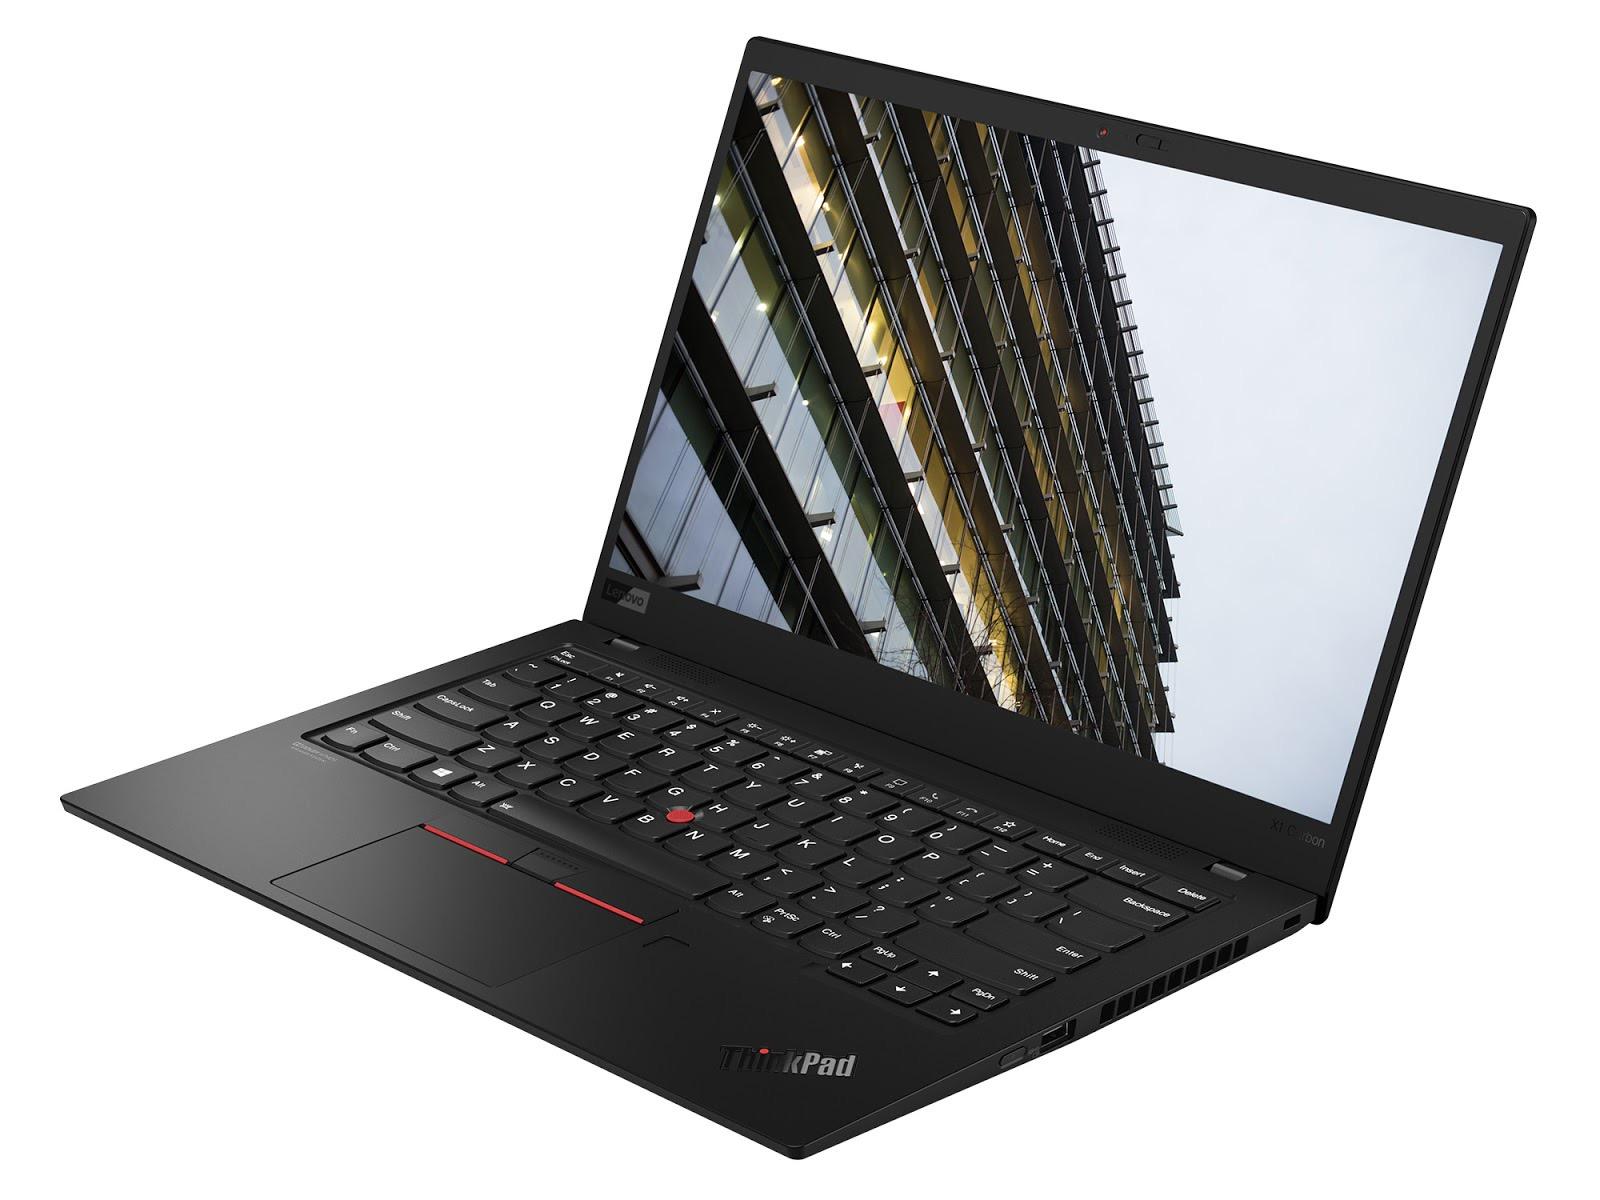 Фото 3. Ноутбук Lenovo ThinkPad X1 Carbon Gen 8 Black (20U90006RT)